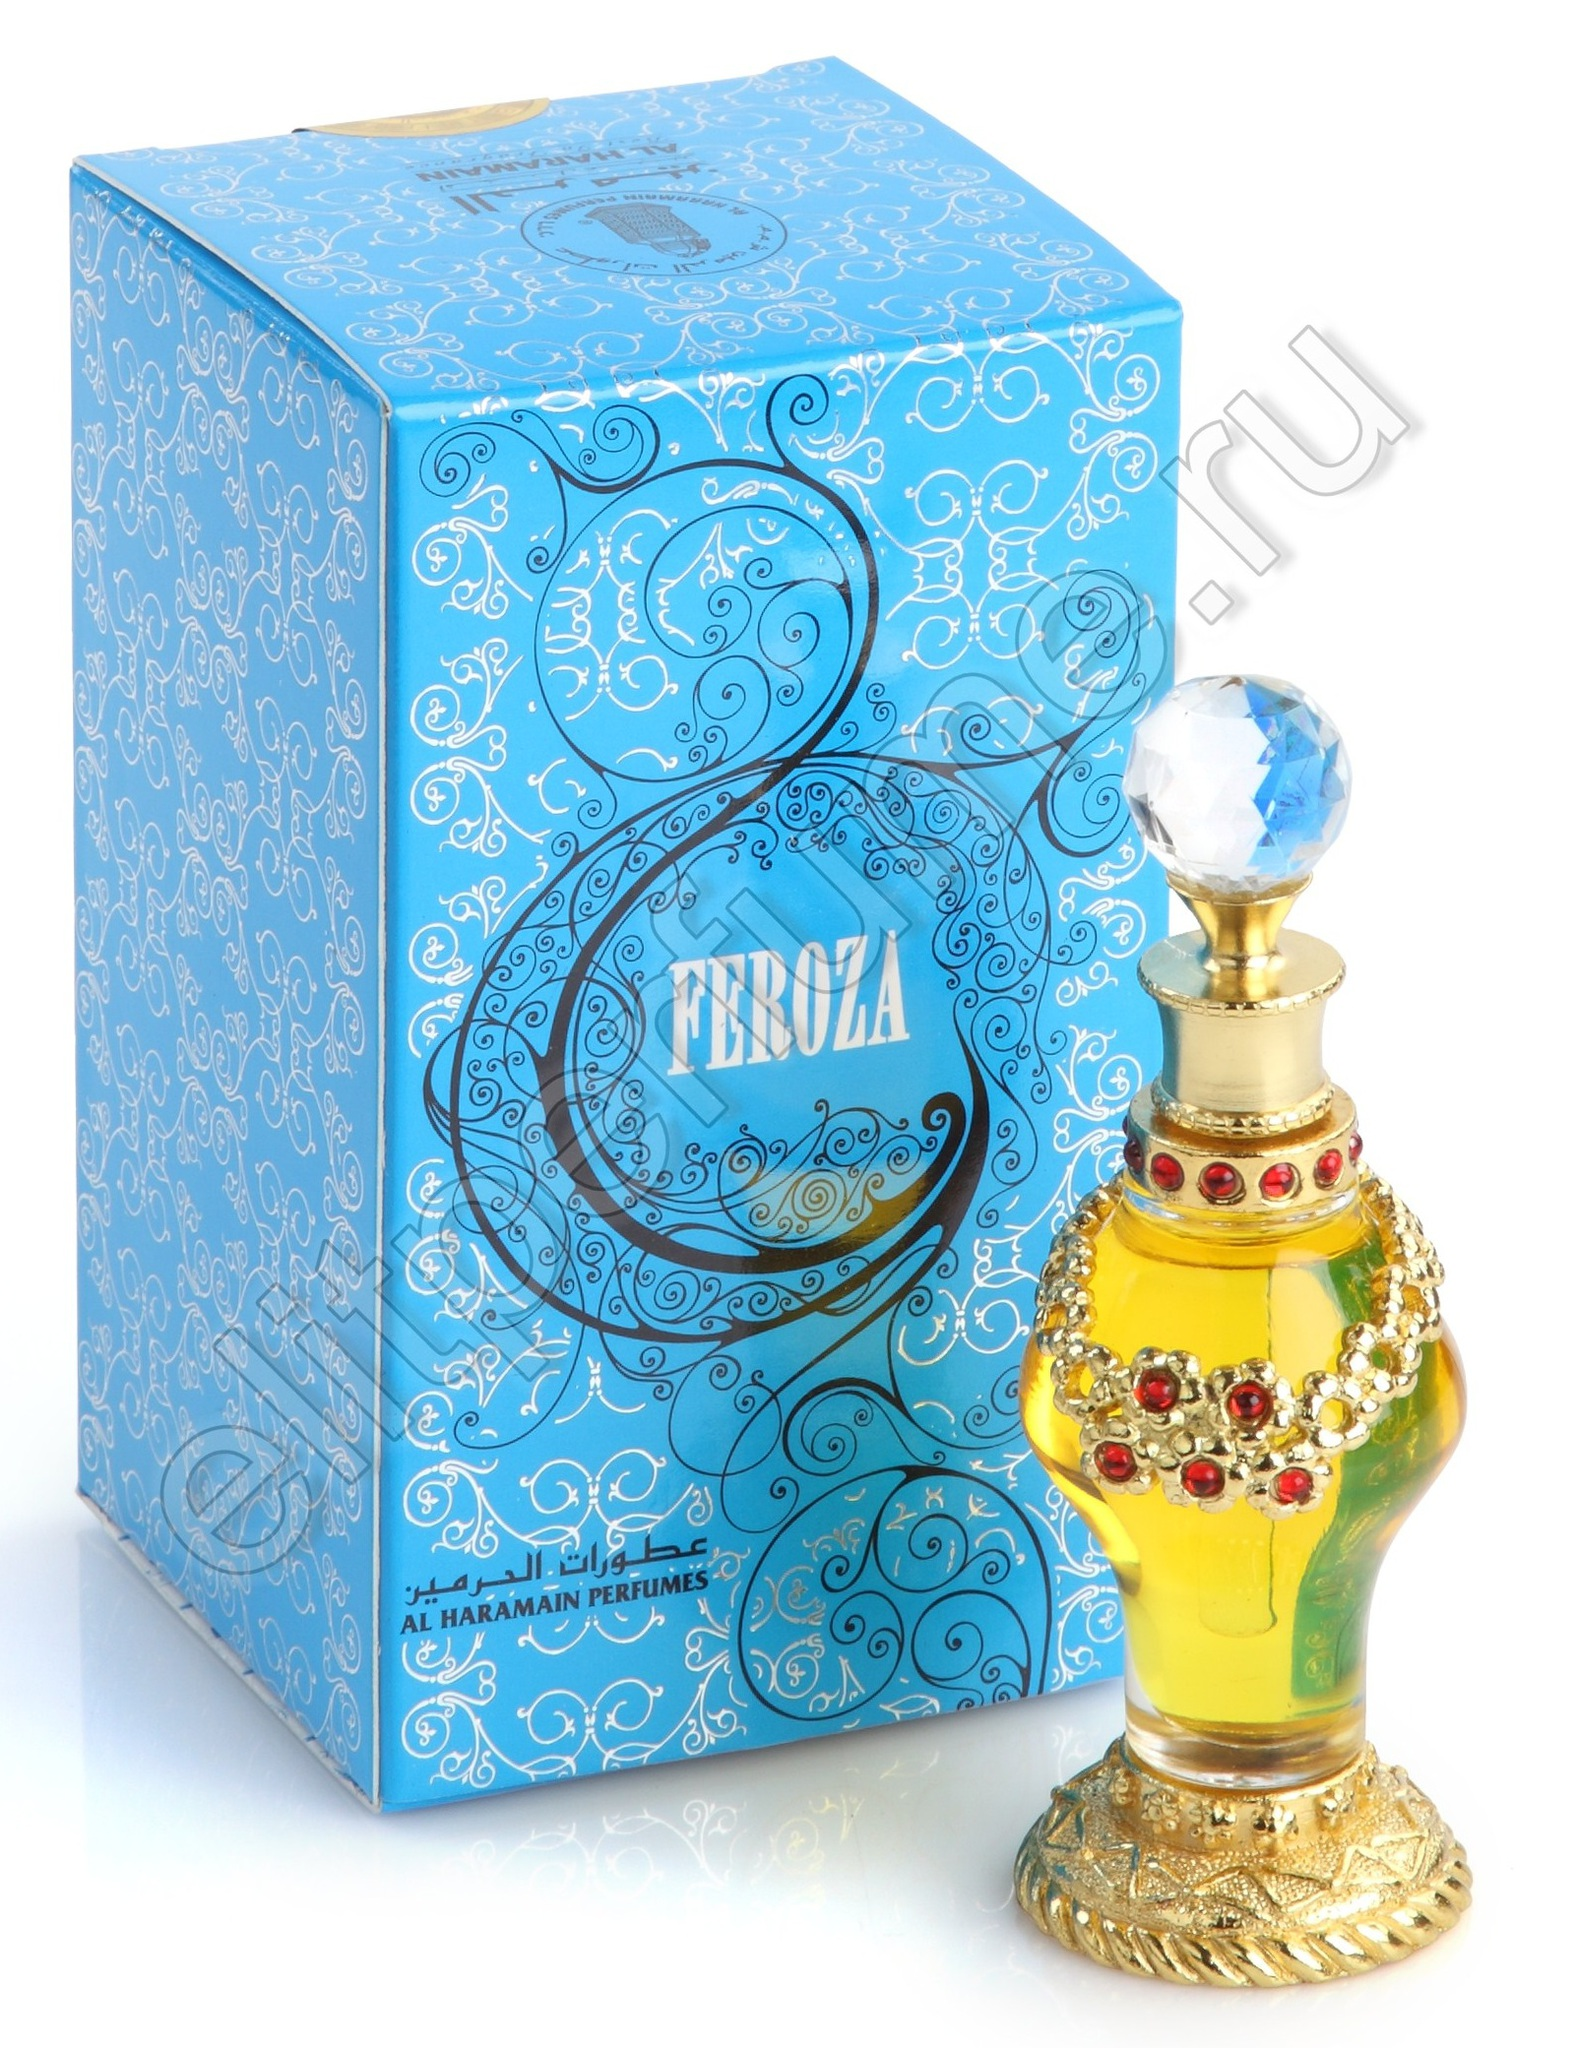 Пробники для духов Фероза Feroza 1 мл арабские масляные духи от Аль Харамайн Al Haramin Perfumes